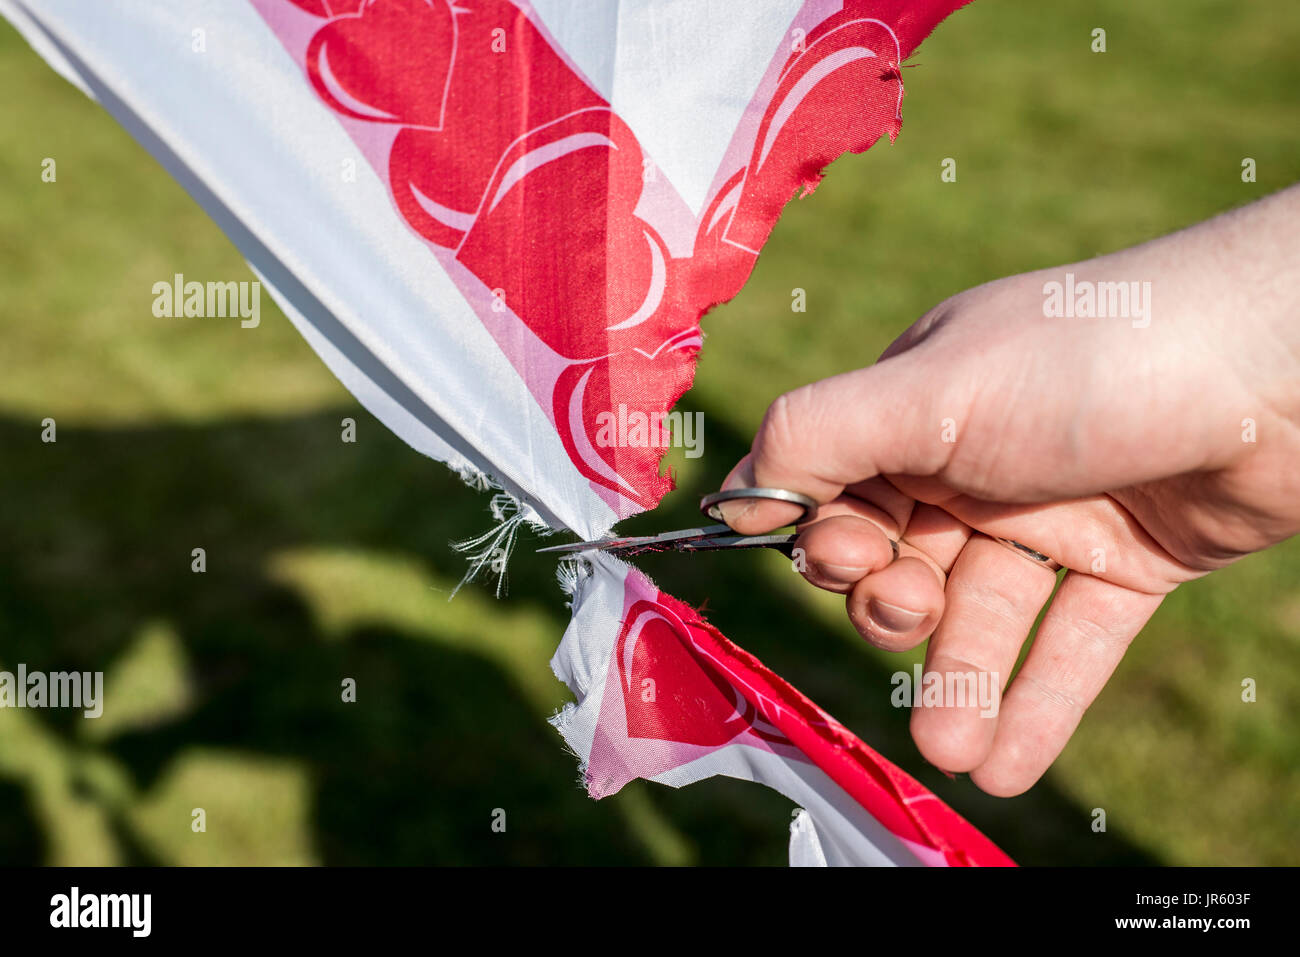 man cuts scissors finger hand on wedding tradition cutout heart detail closeup - Stock Image